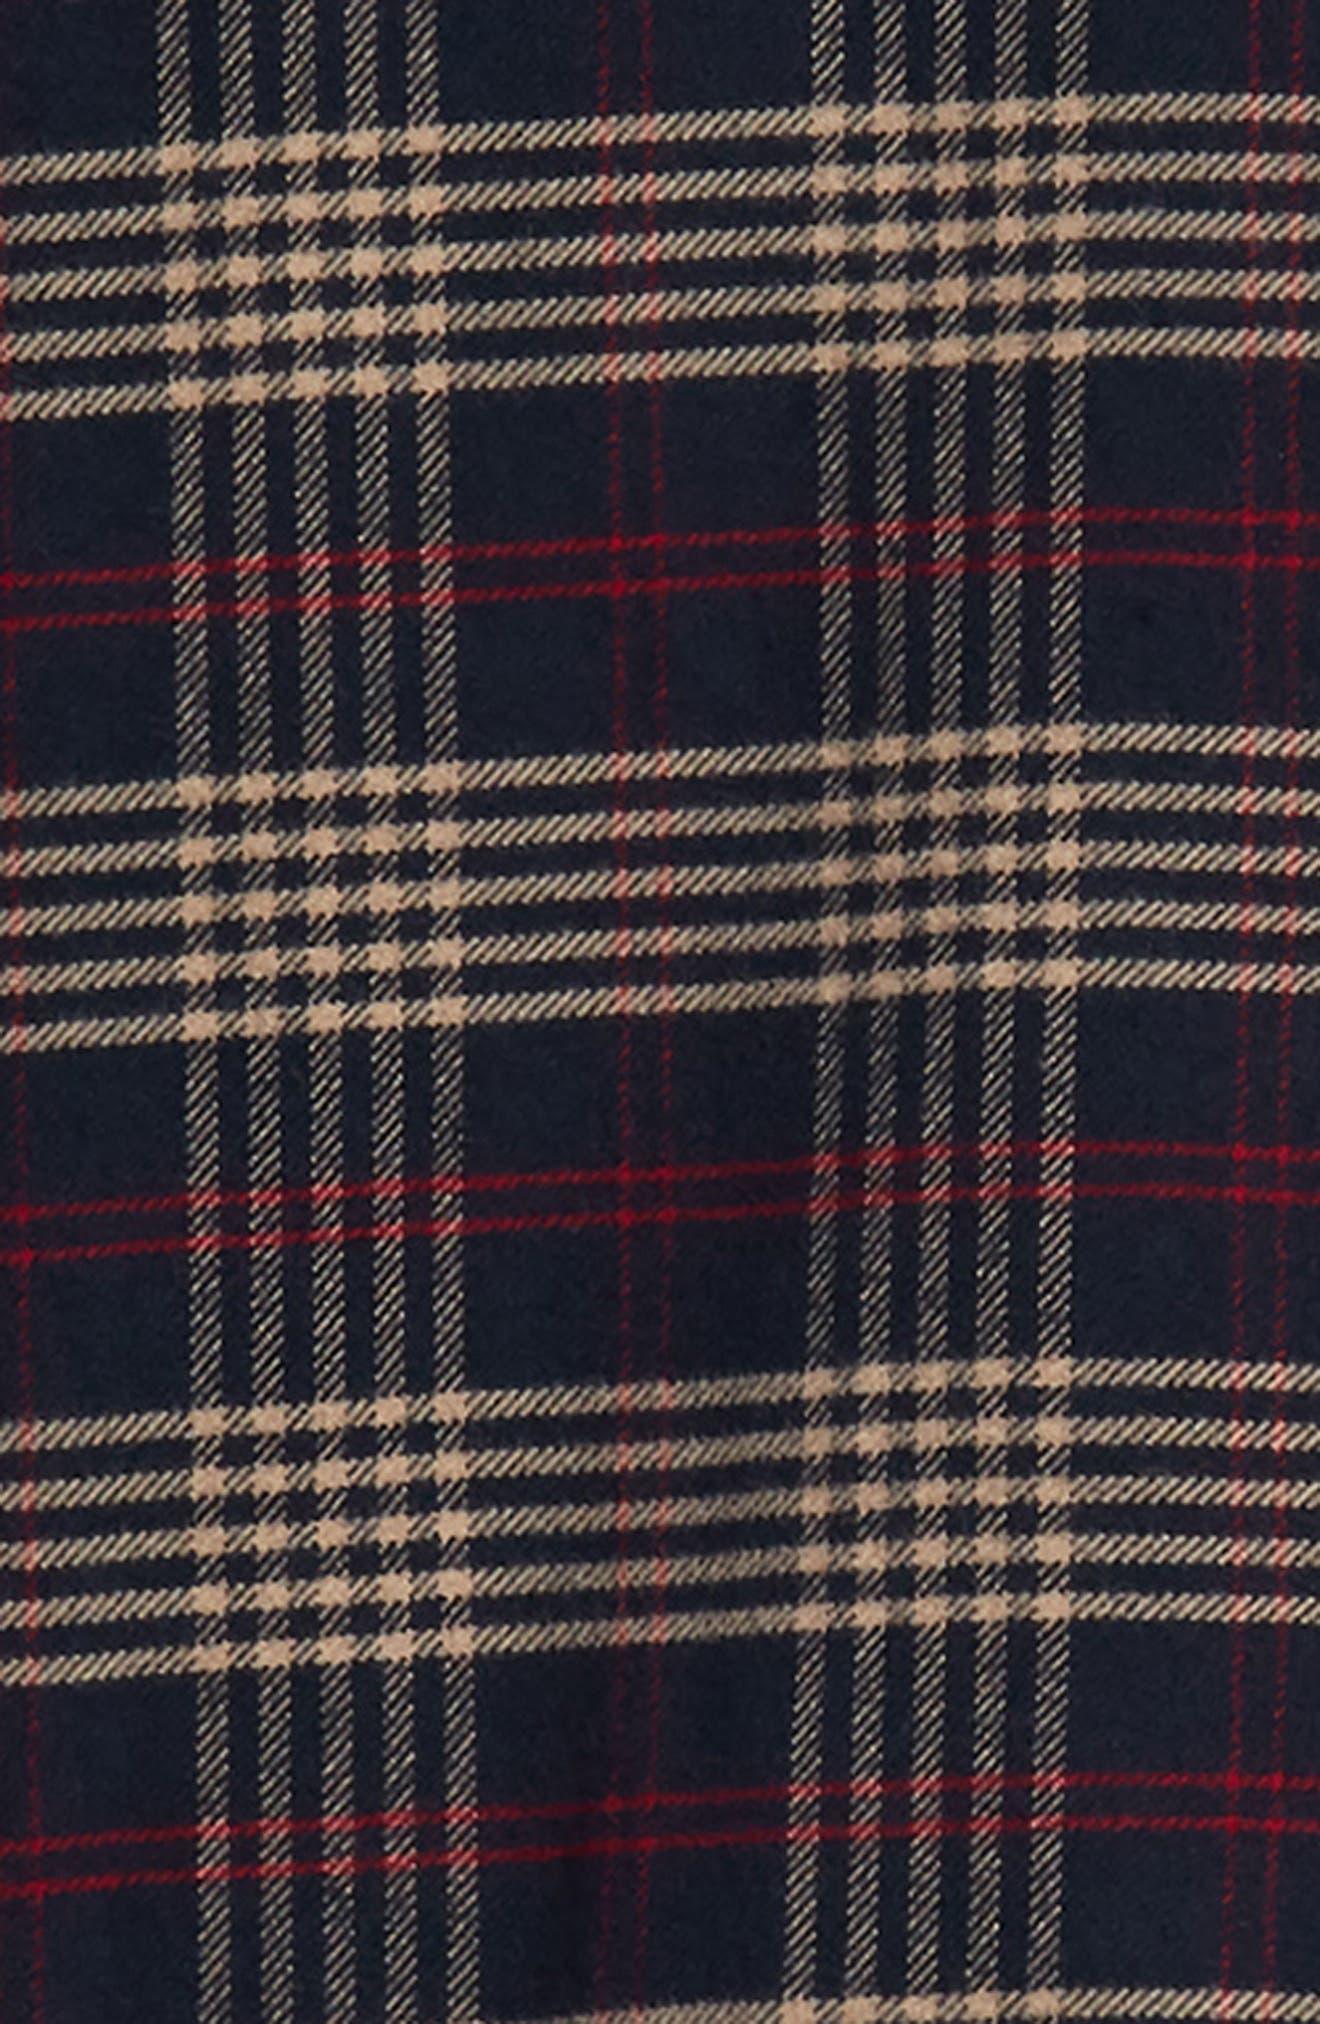 Forrest Slim Fit Plaid Flannel Sport Shirt,                             Alternate thumbnail 6, color,                             NAVY/RED/ELM